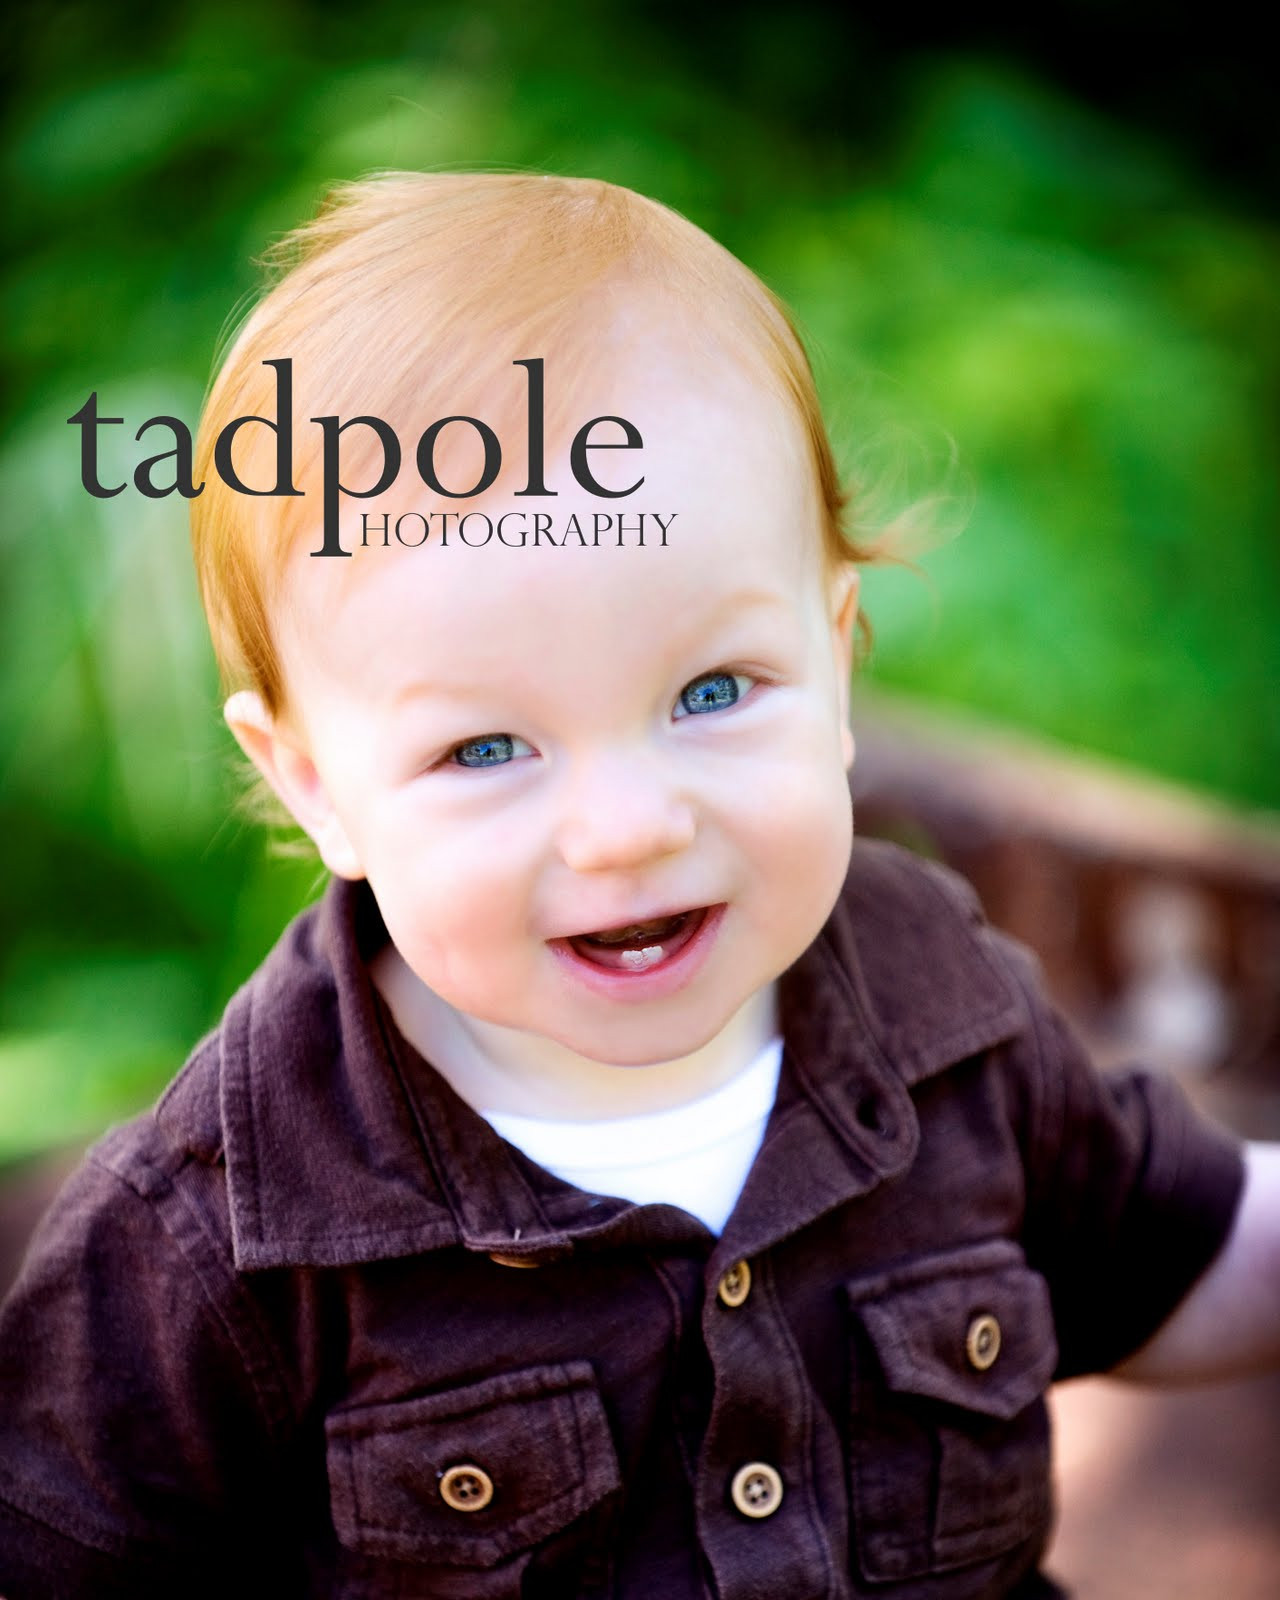 Tadpole_1